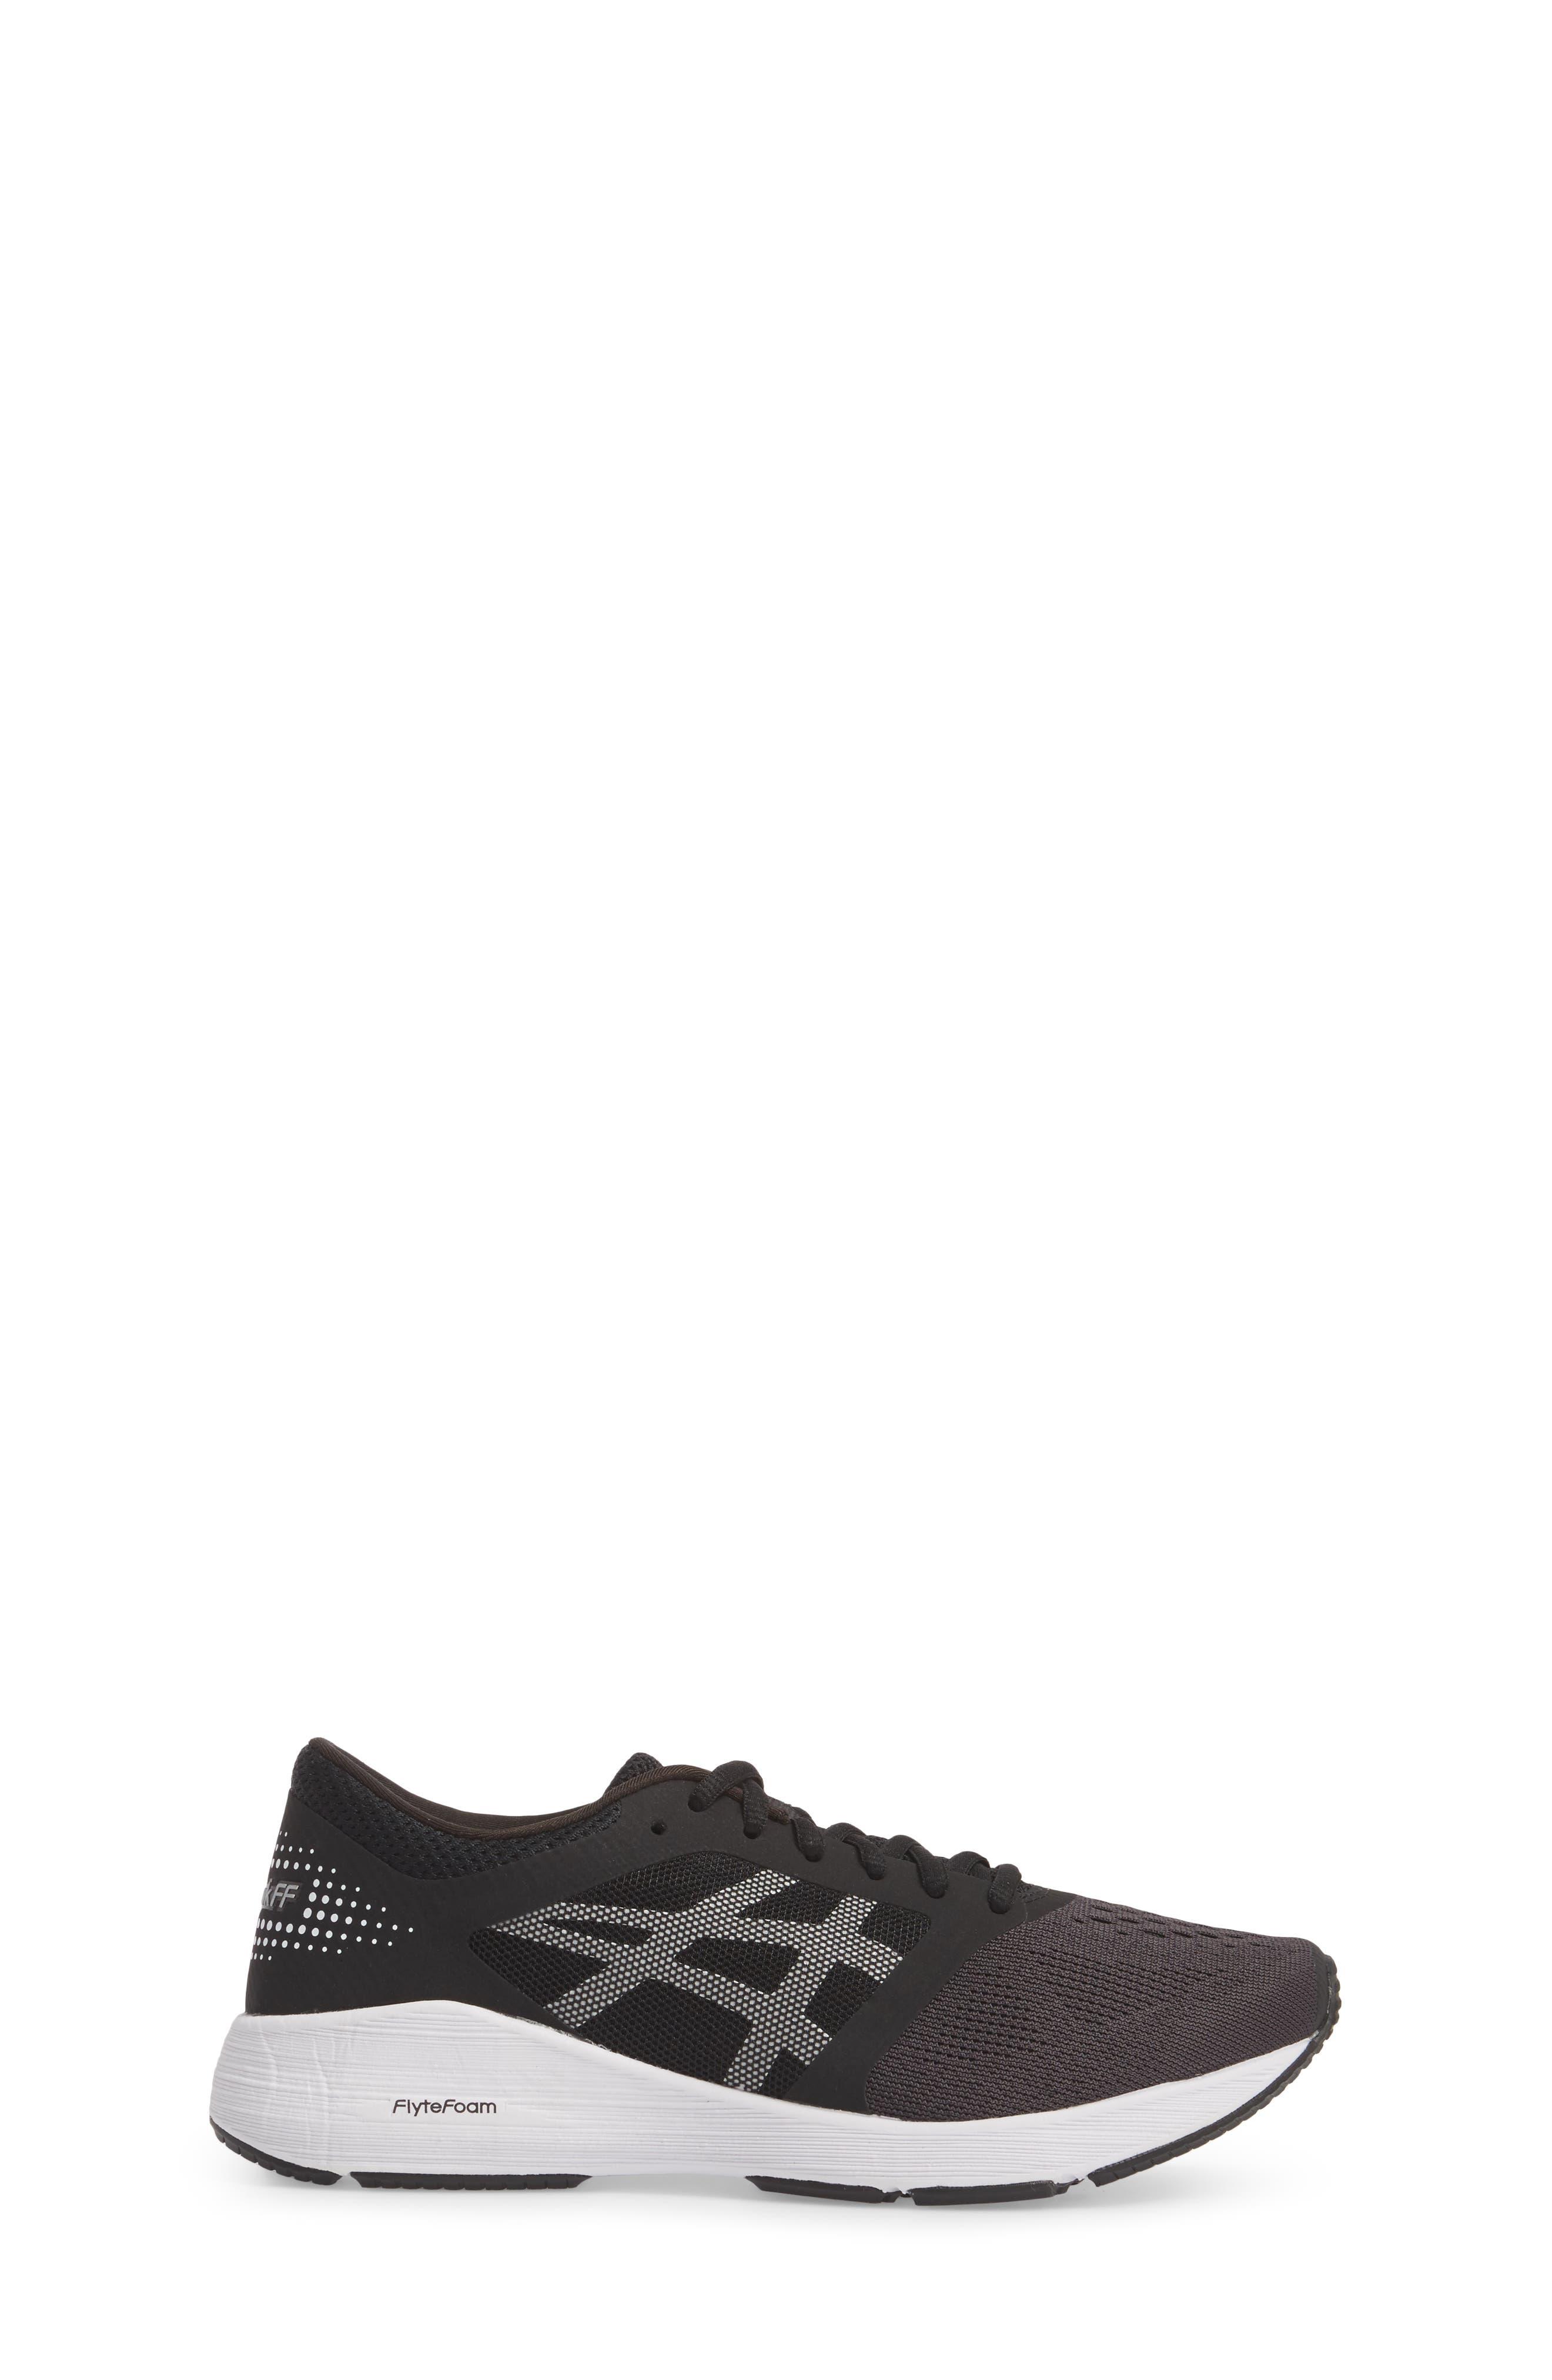 Roadhawk FF GS Running Shoe,                             Alternate thumbnail 3, color,                             001